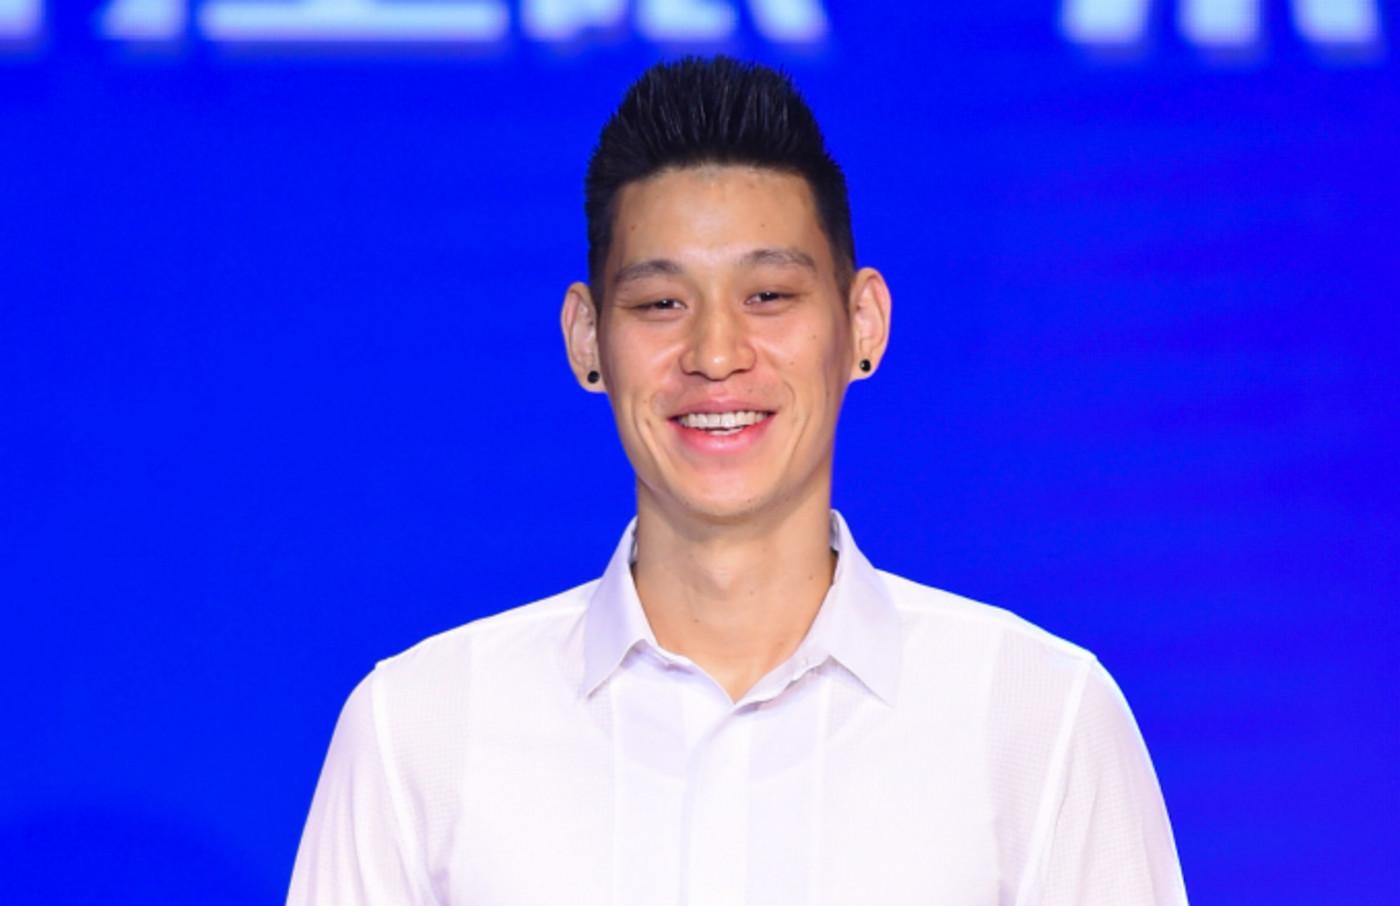 NBA player Jeremy Lin of the Toronto Raptors